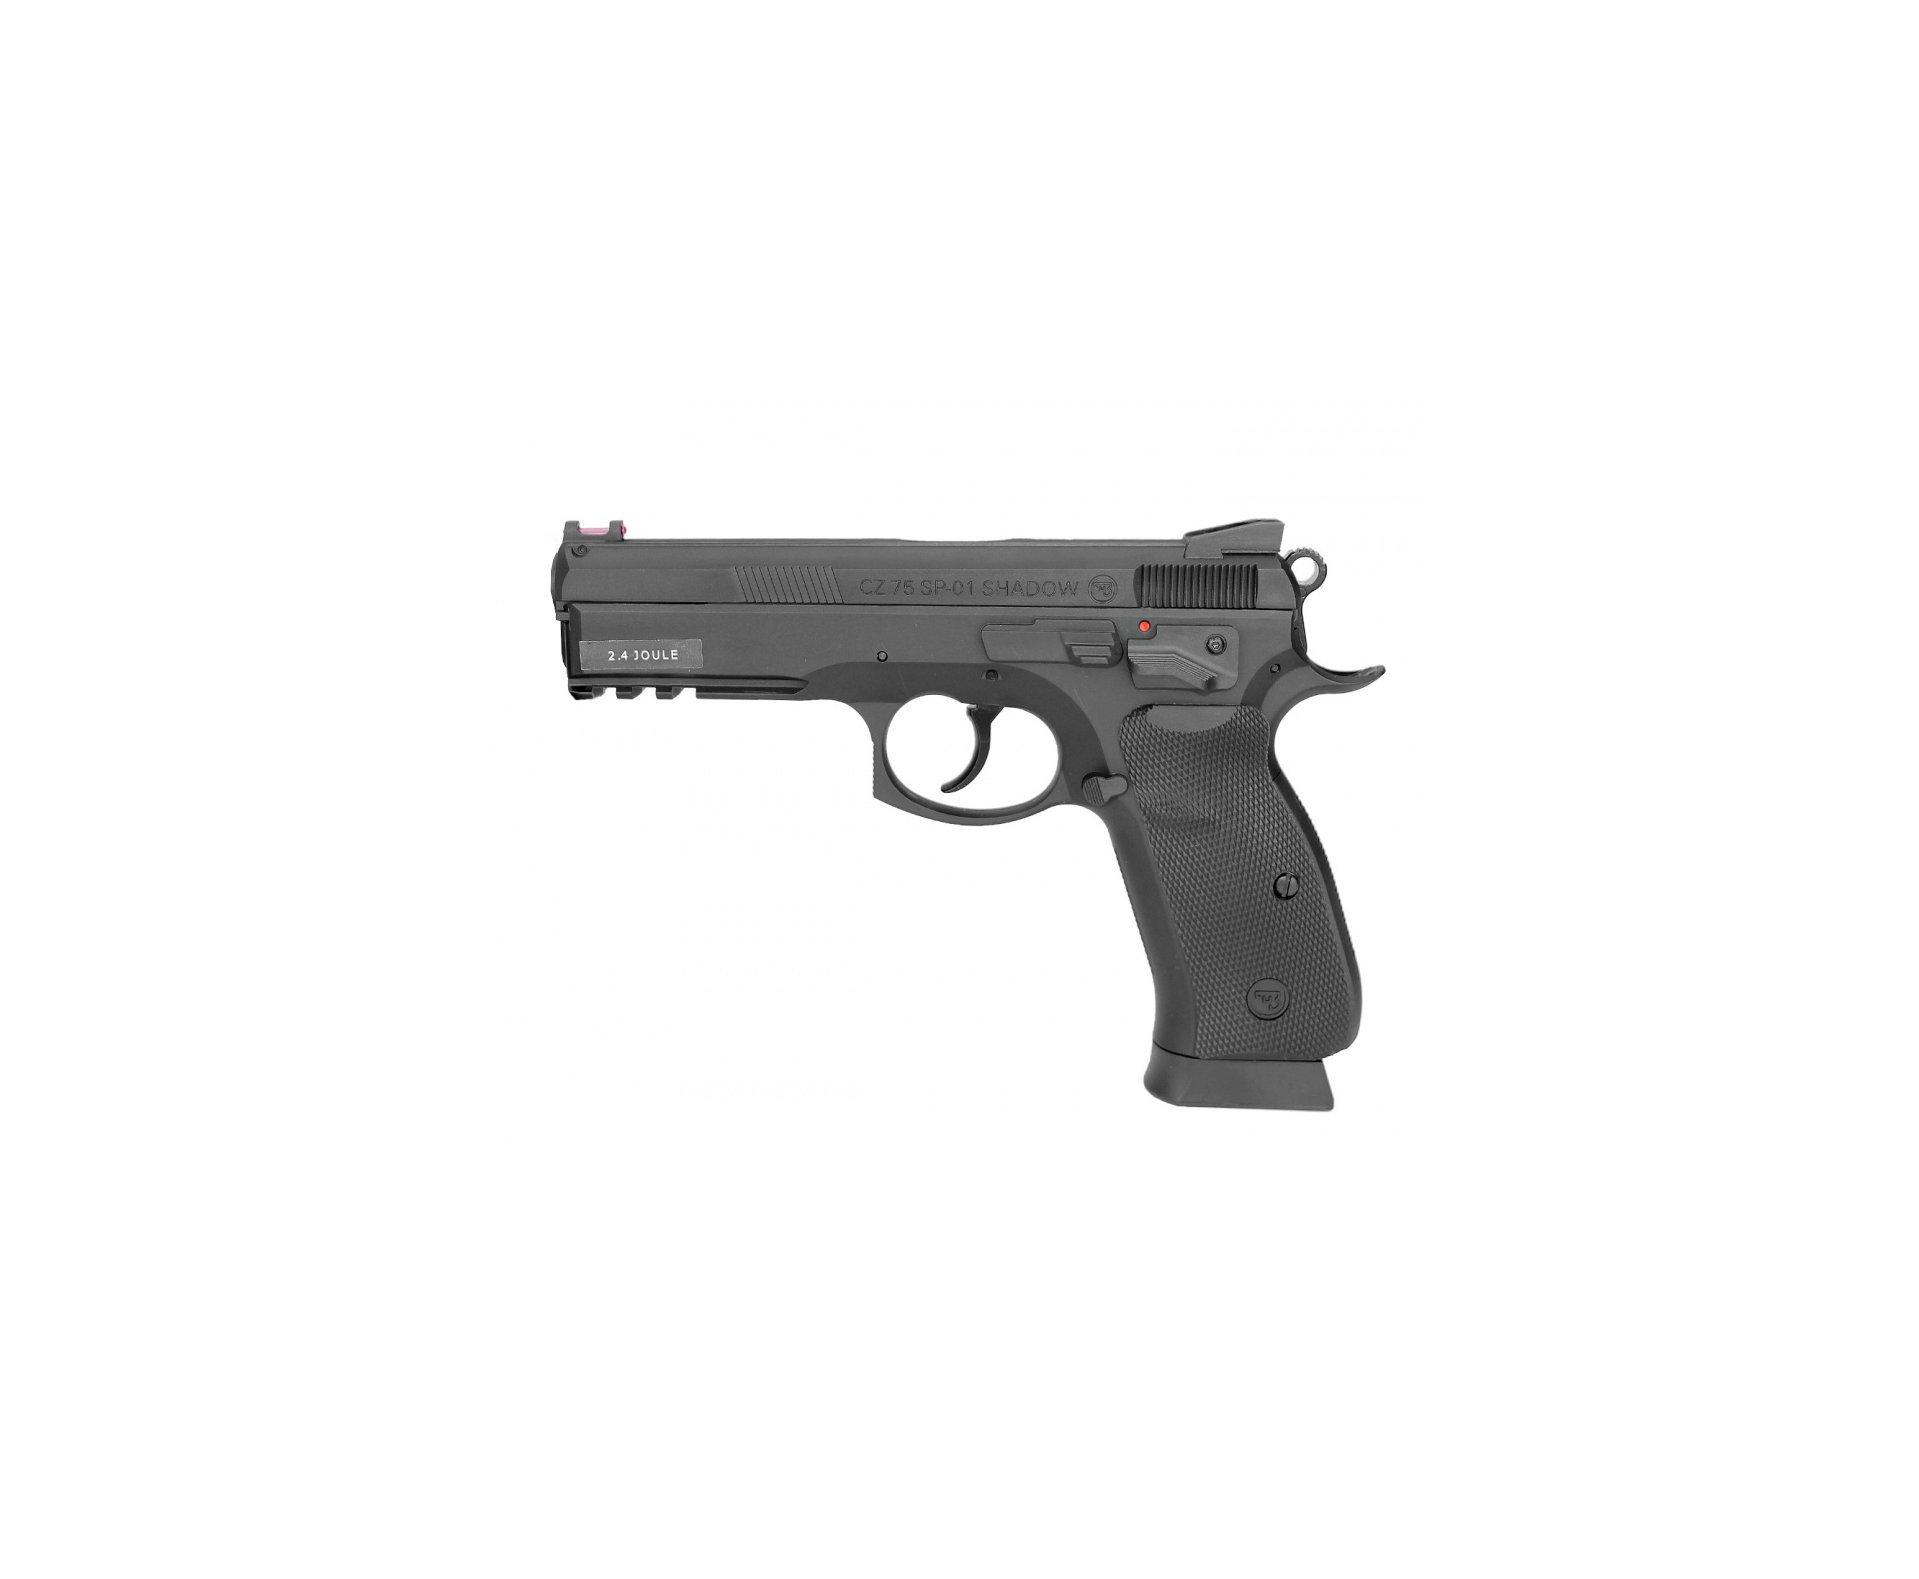 Pistola De Pressão Co2 Cz 75 Sp-01 Shadow 4,5mm 2,4j Asg